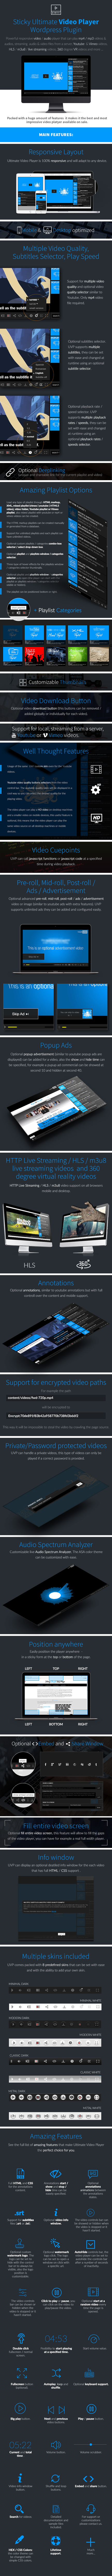 Sticky Ultimate Video Player Wordpress Plugin - 6